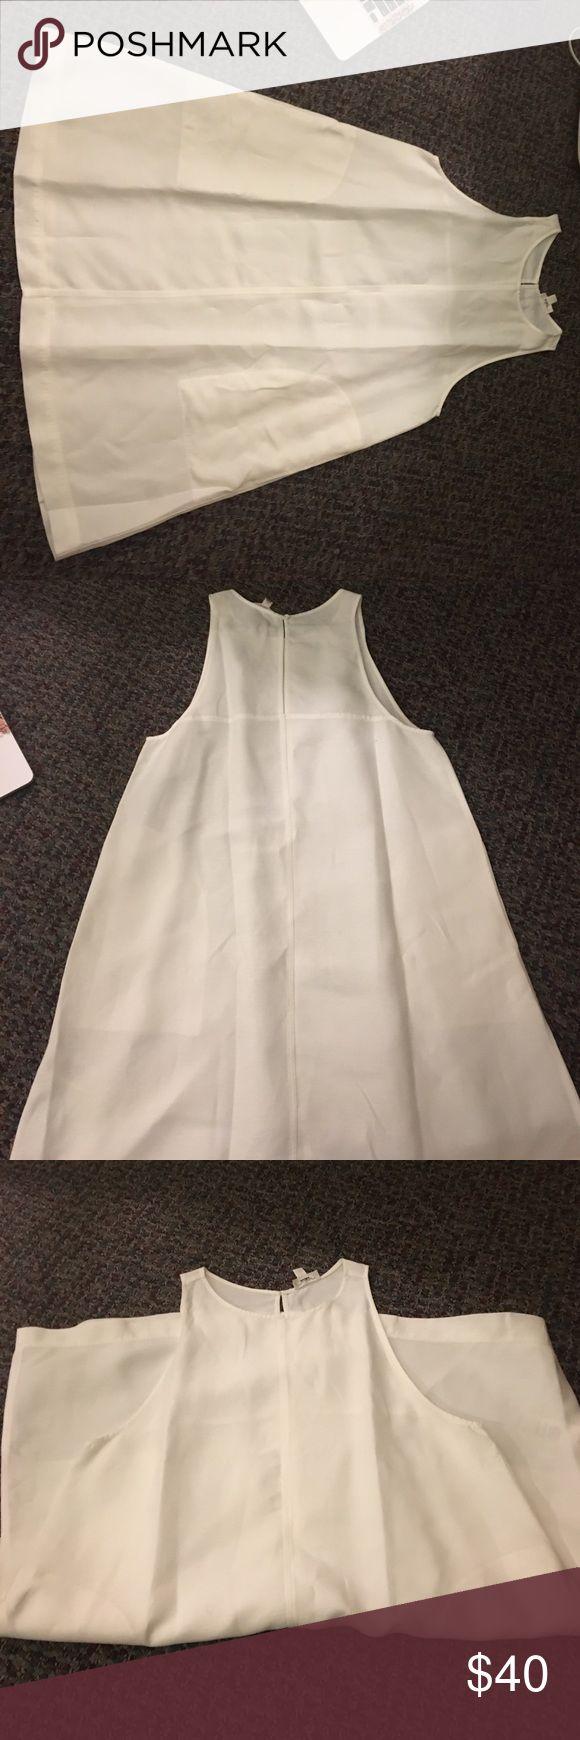 Wilfred White Dress Worn once Aritzia Dresses